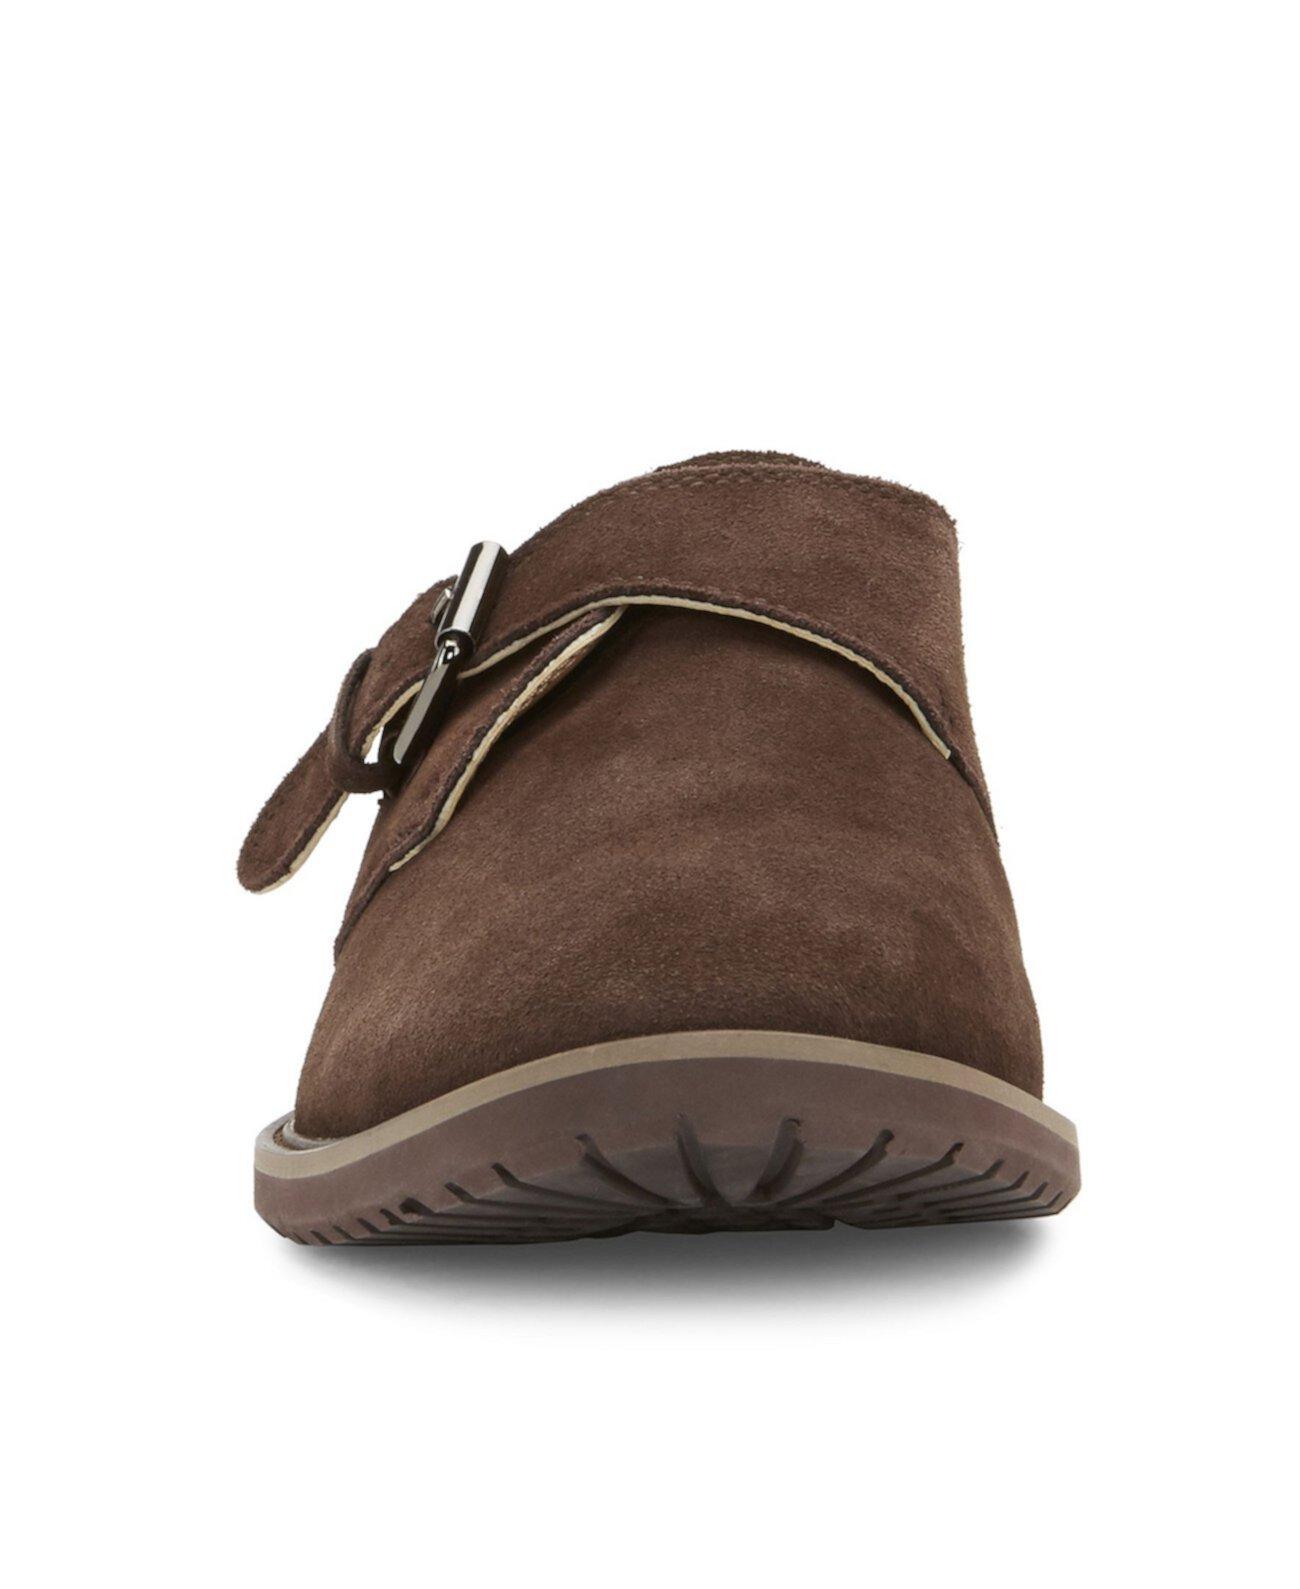 Мужской ремешок Stanton Monk Reserved Footwear